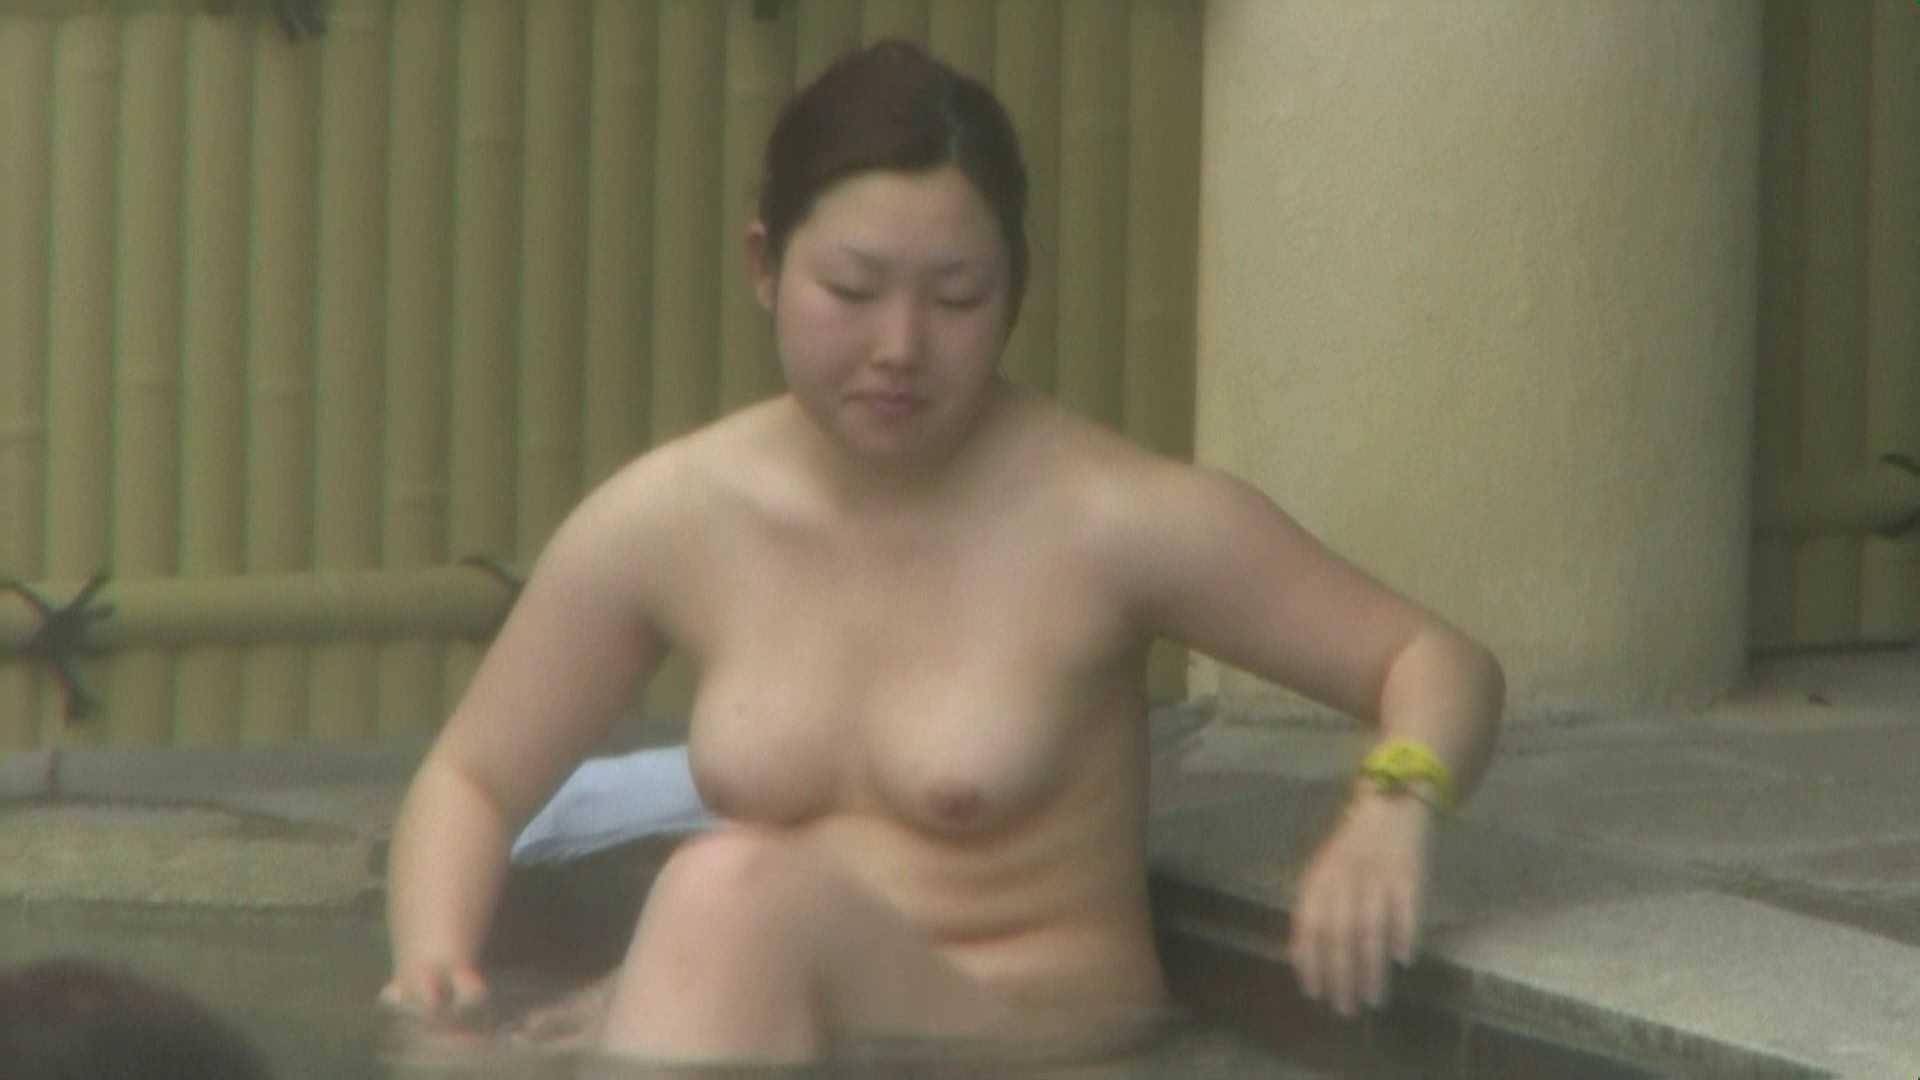 Aquaな露天風呂Vol.72【VIP限定】 露天風呂突入 | 盗撮師作品  76pic 58